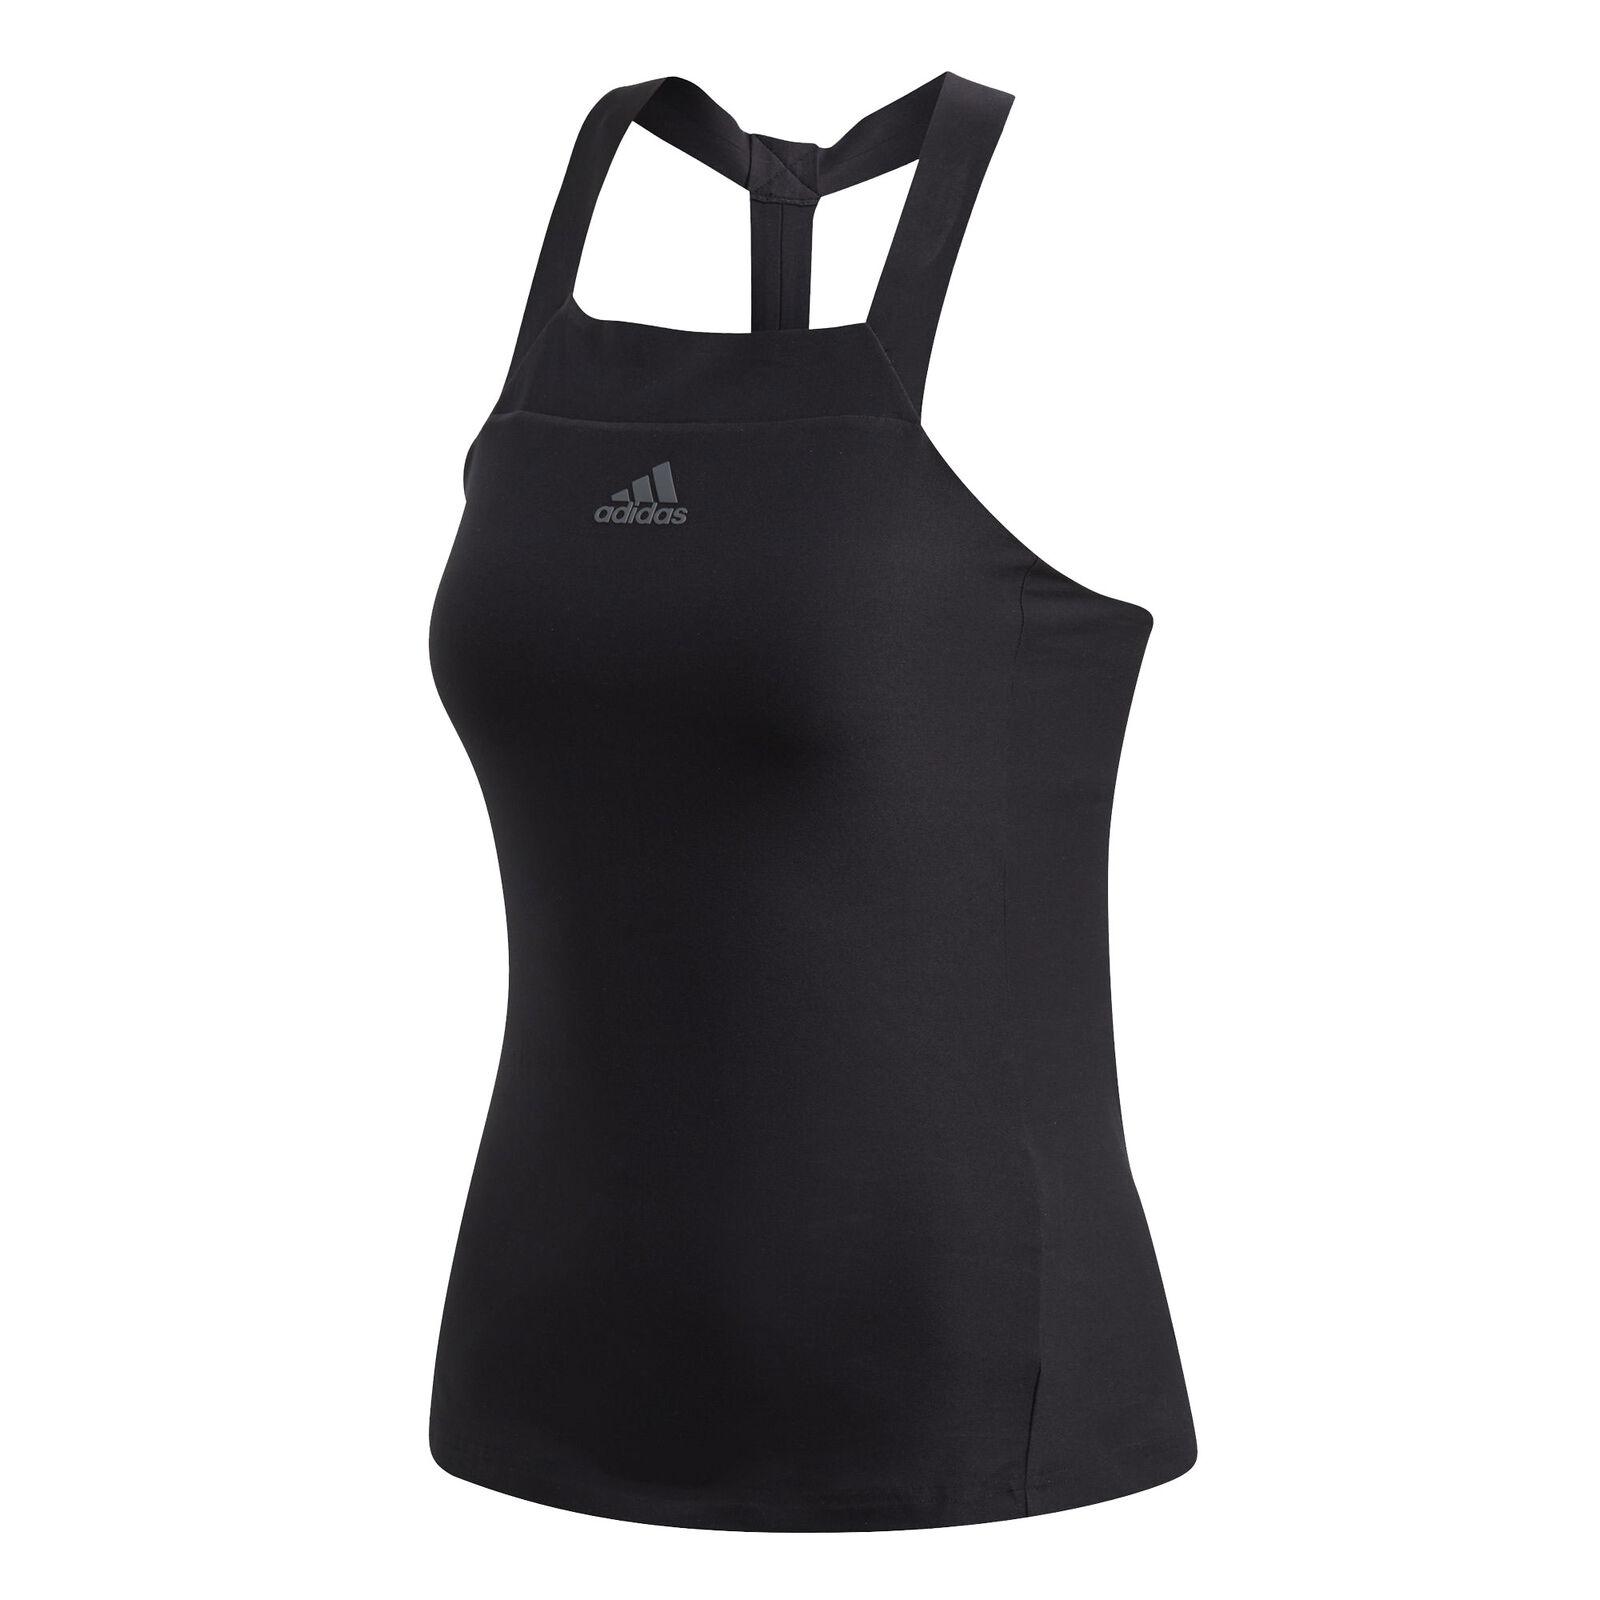 Adidas Women's Barricade Climalite Breathable Lightweight Tennis Tank Top